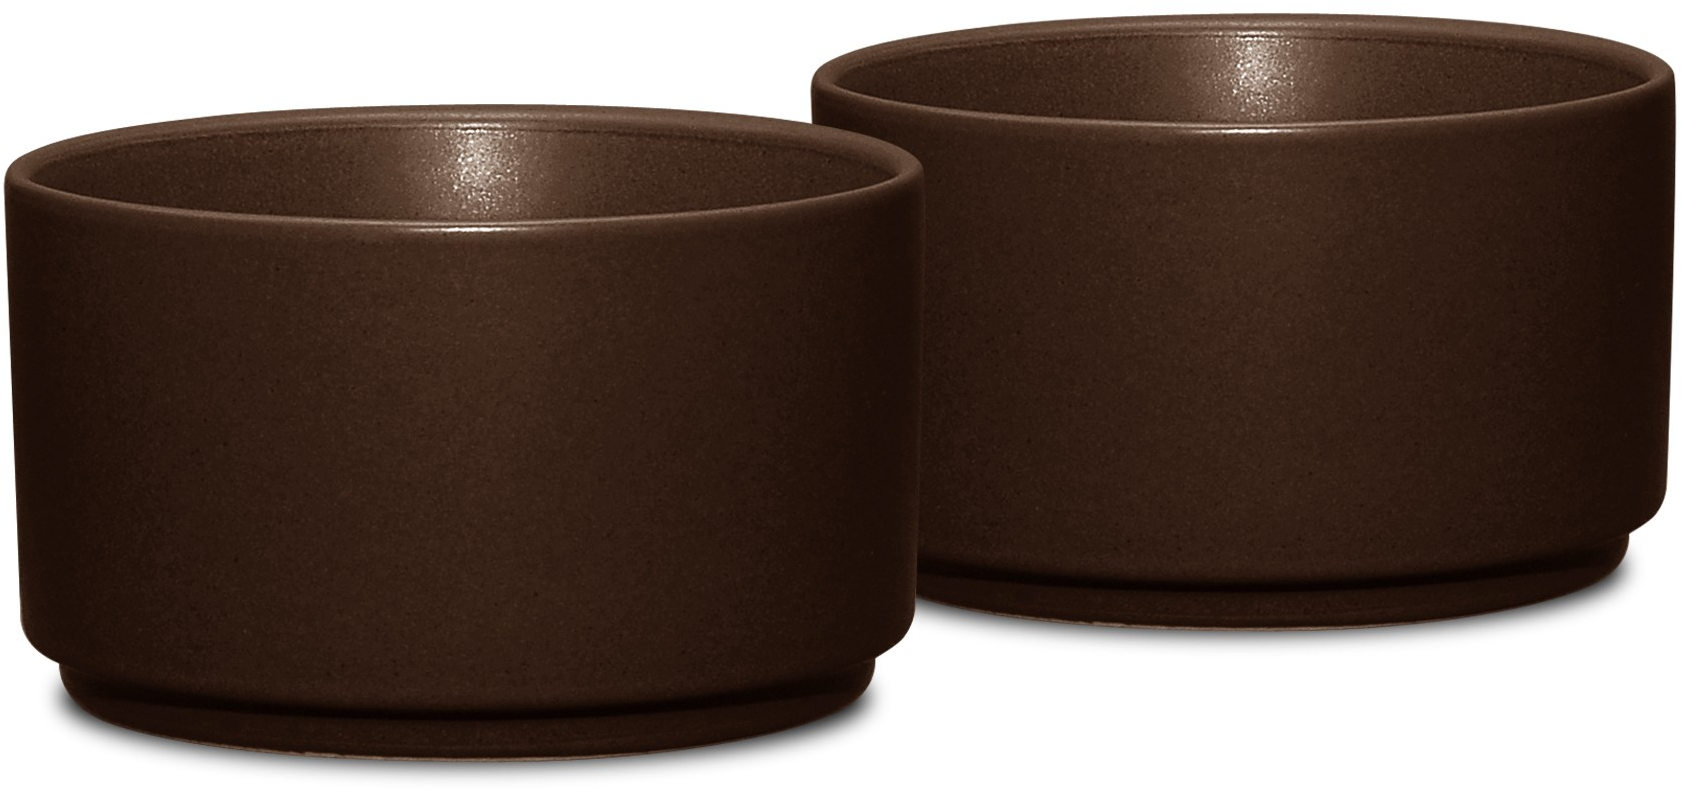 "Noritake Colorwave Chocolate Bakeware—Set of 2, Ramekin, 3 3/4"", 9 oz."